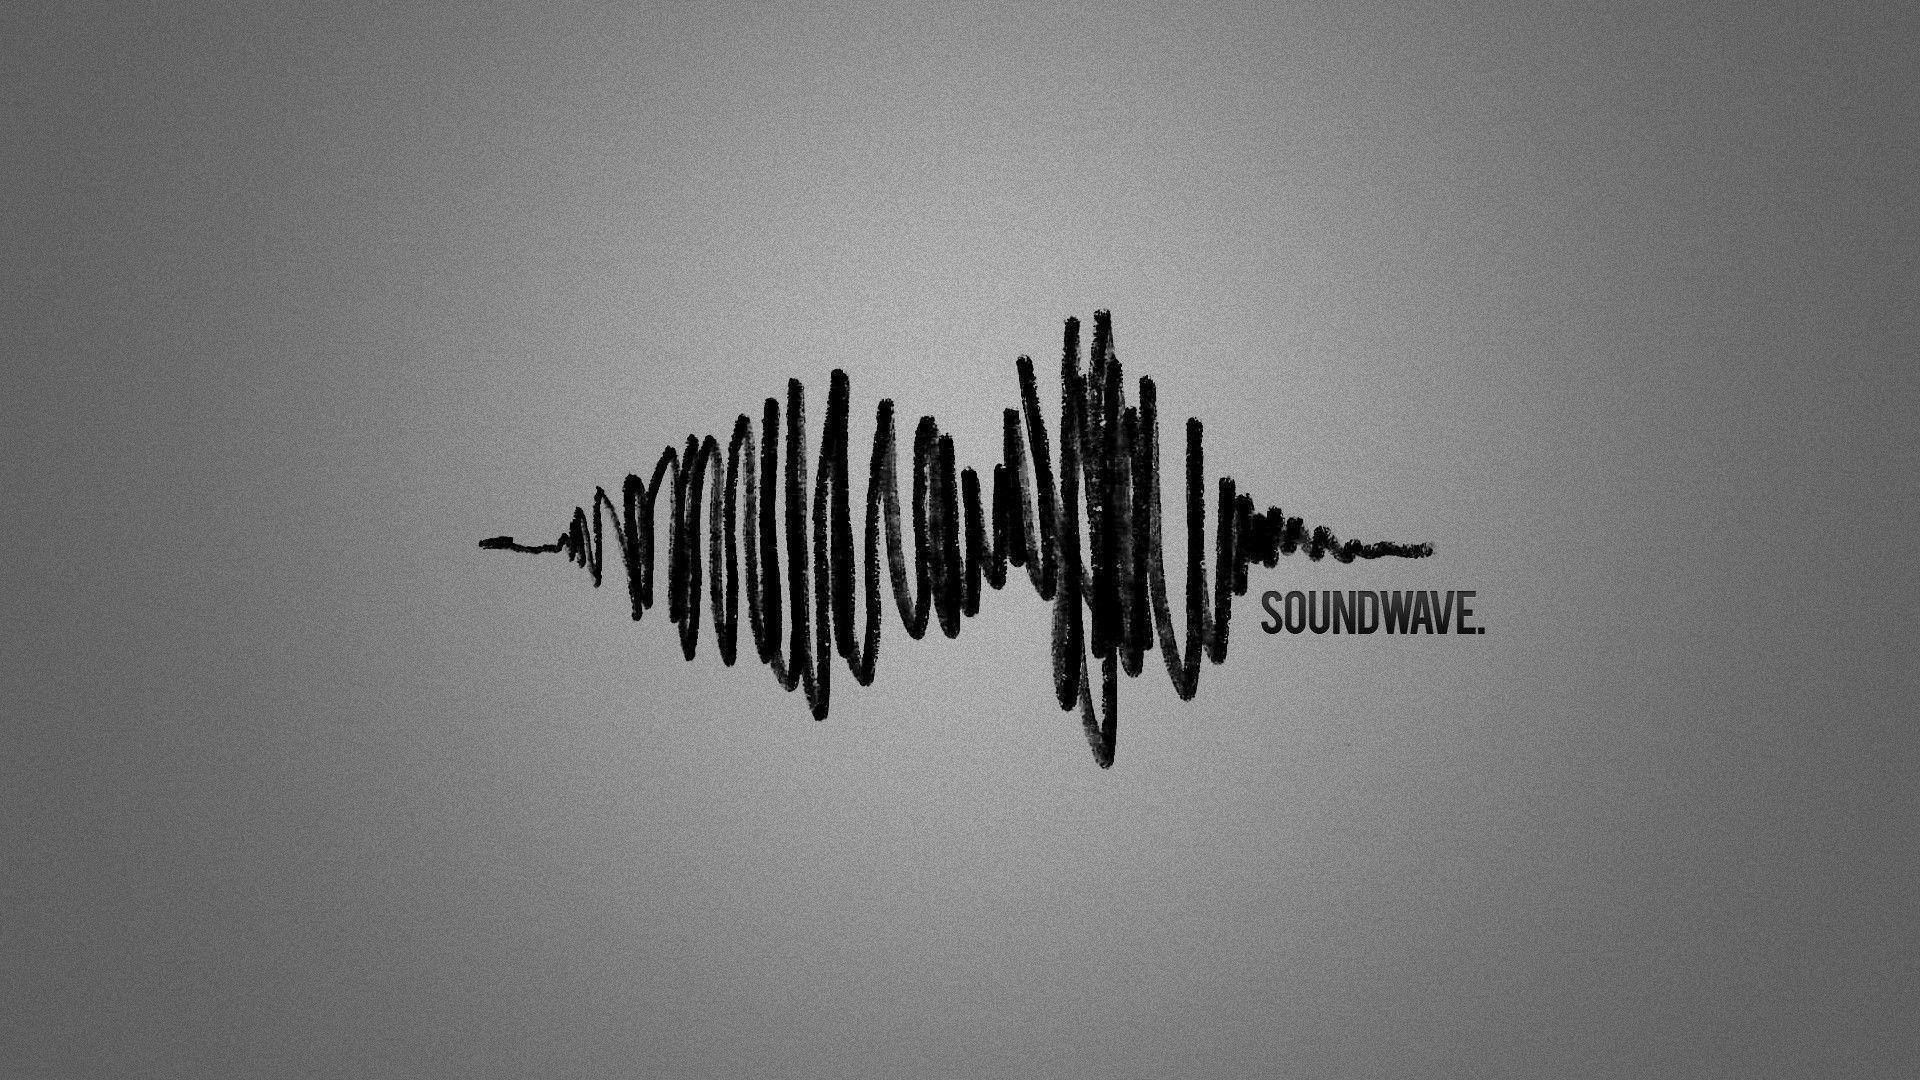 Most Inspiring Wallpaper Music Soundwave - 534698-sound-wave-wallpaper-1920x1080-for-samsung  Pictures_597691.jpg